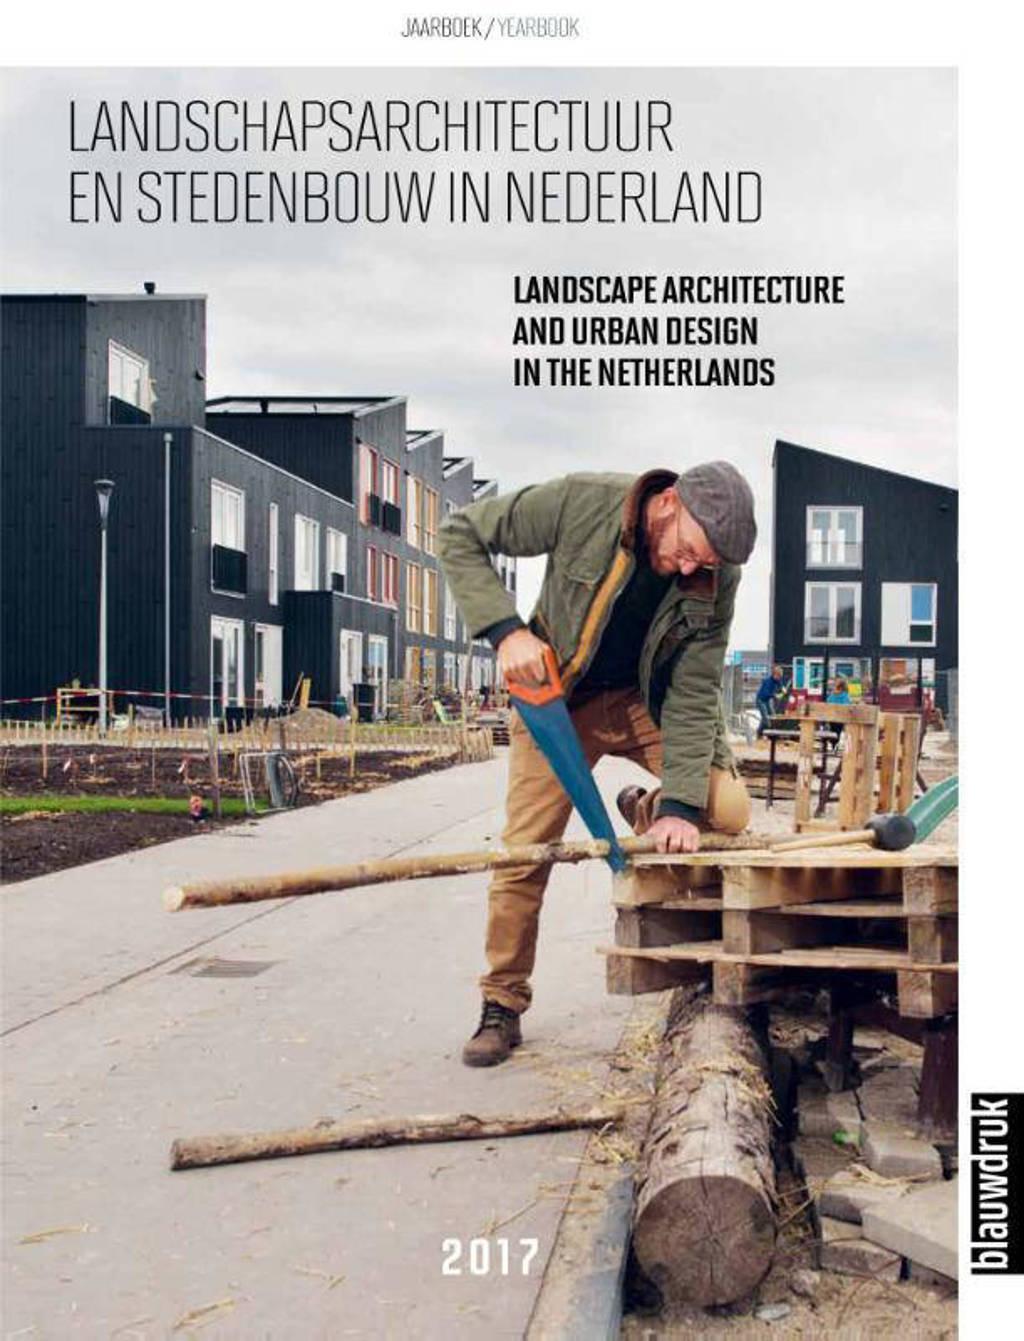 Landschapsarchitectuur en stedenbouw in Nederland 2017 - Mark Hendriks, Joks Janssen, Marieke Berkers, e.a.